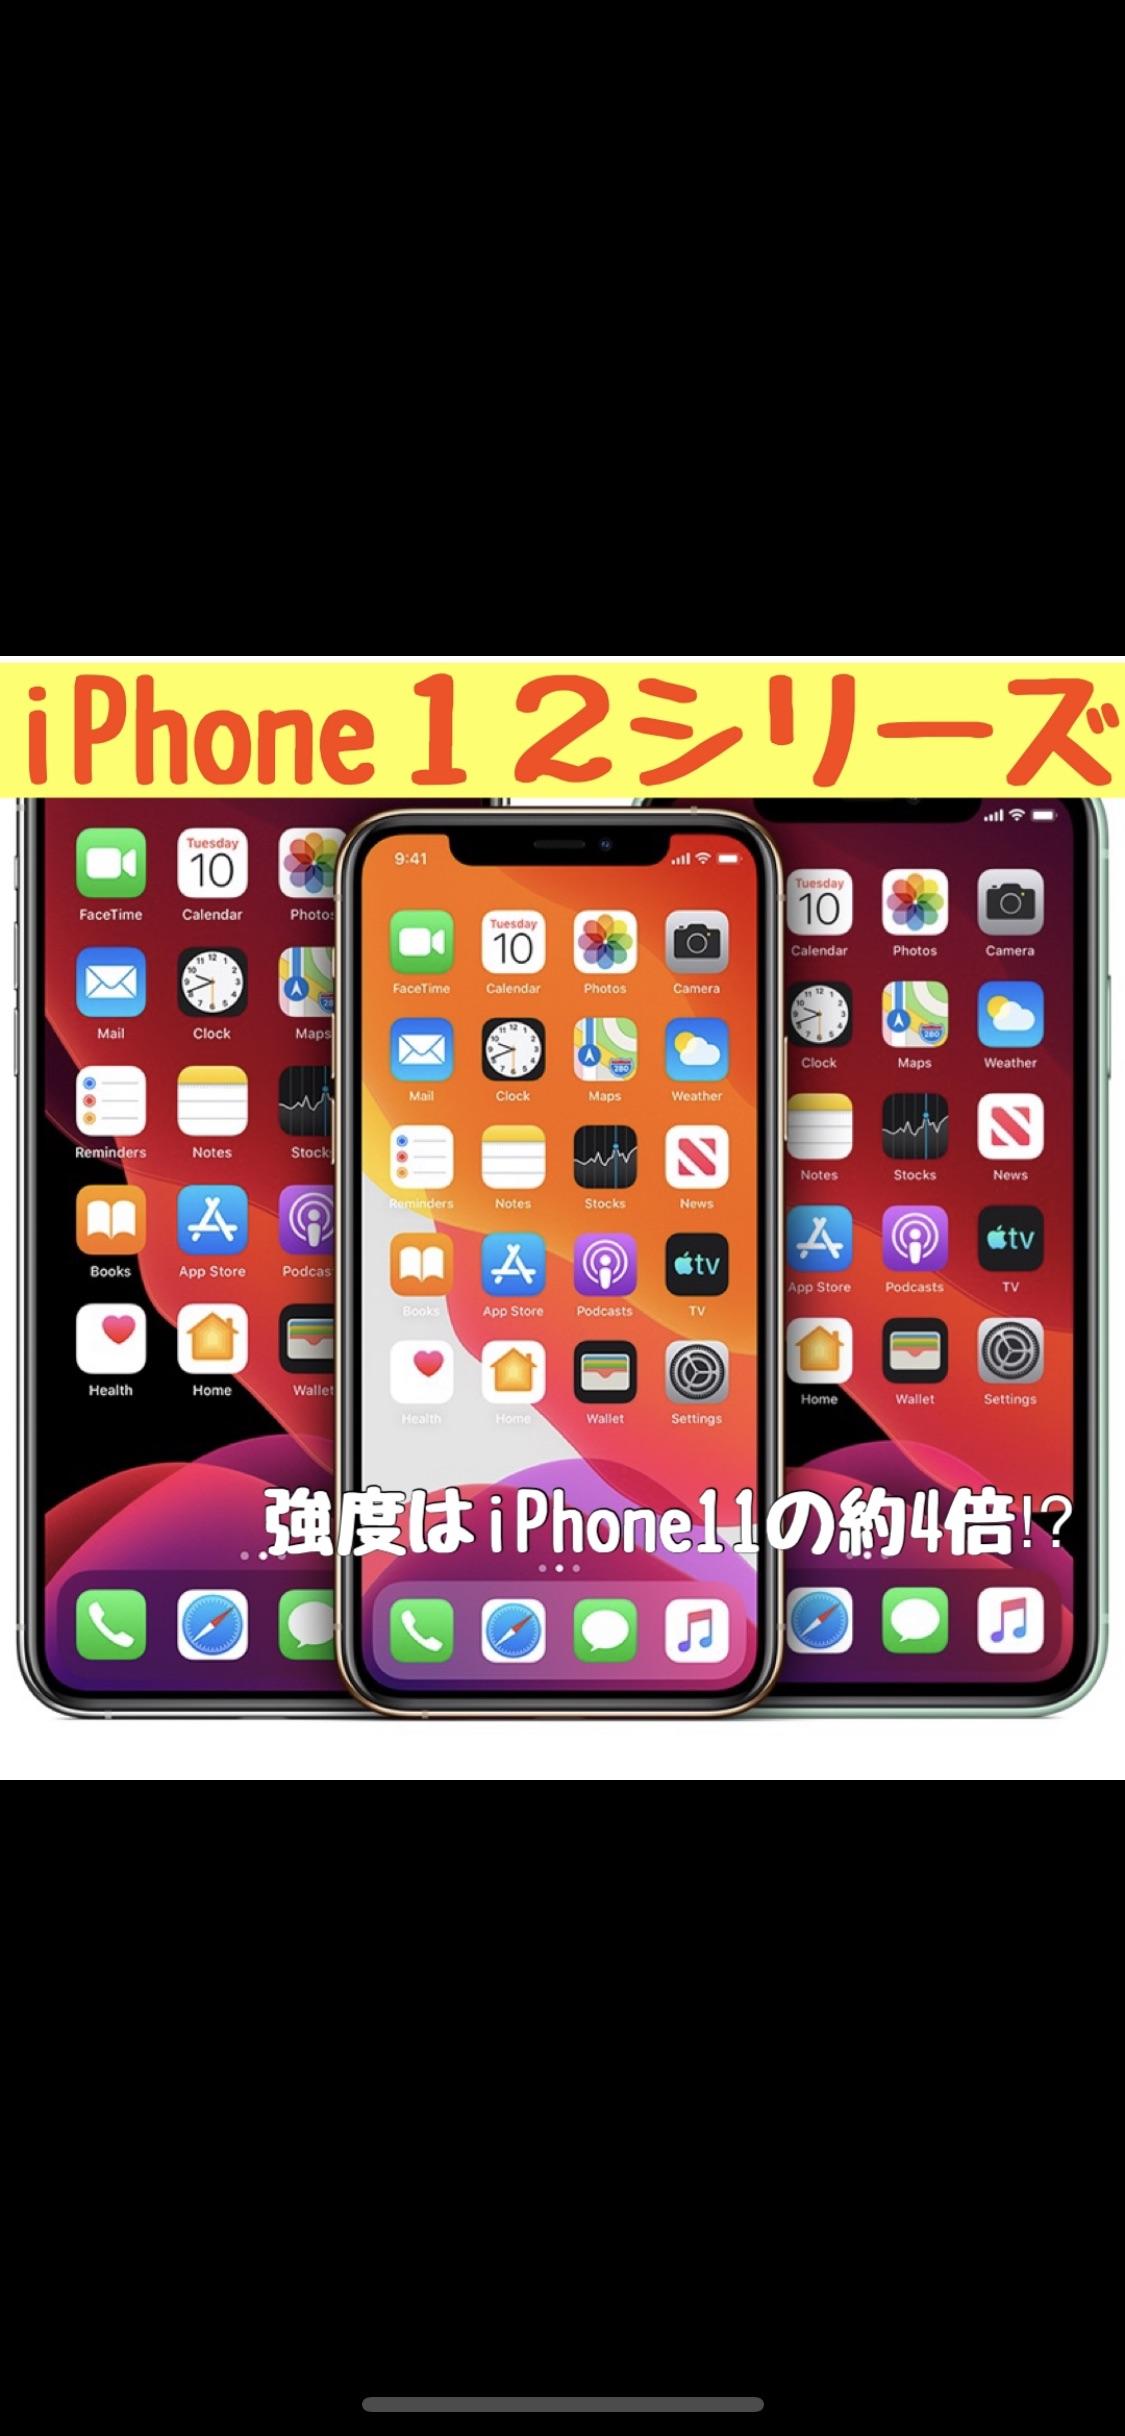 iPhone12 アイフォン12 画面割れ パネル割れ iPhone修理 岩倉市 江南 犬山市